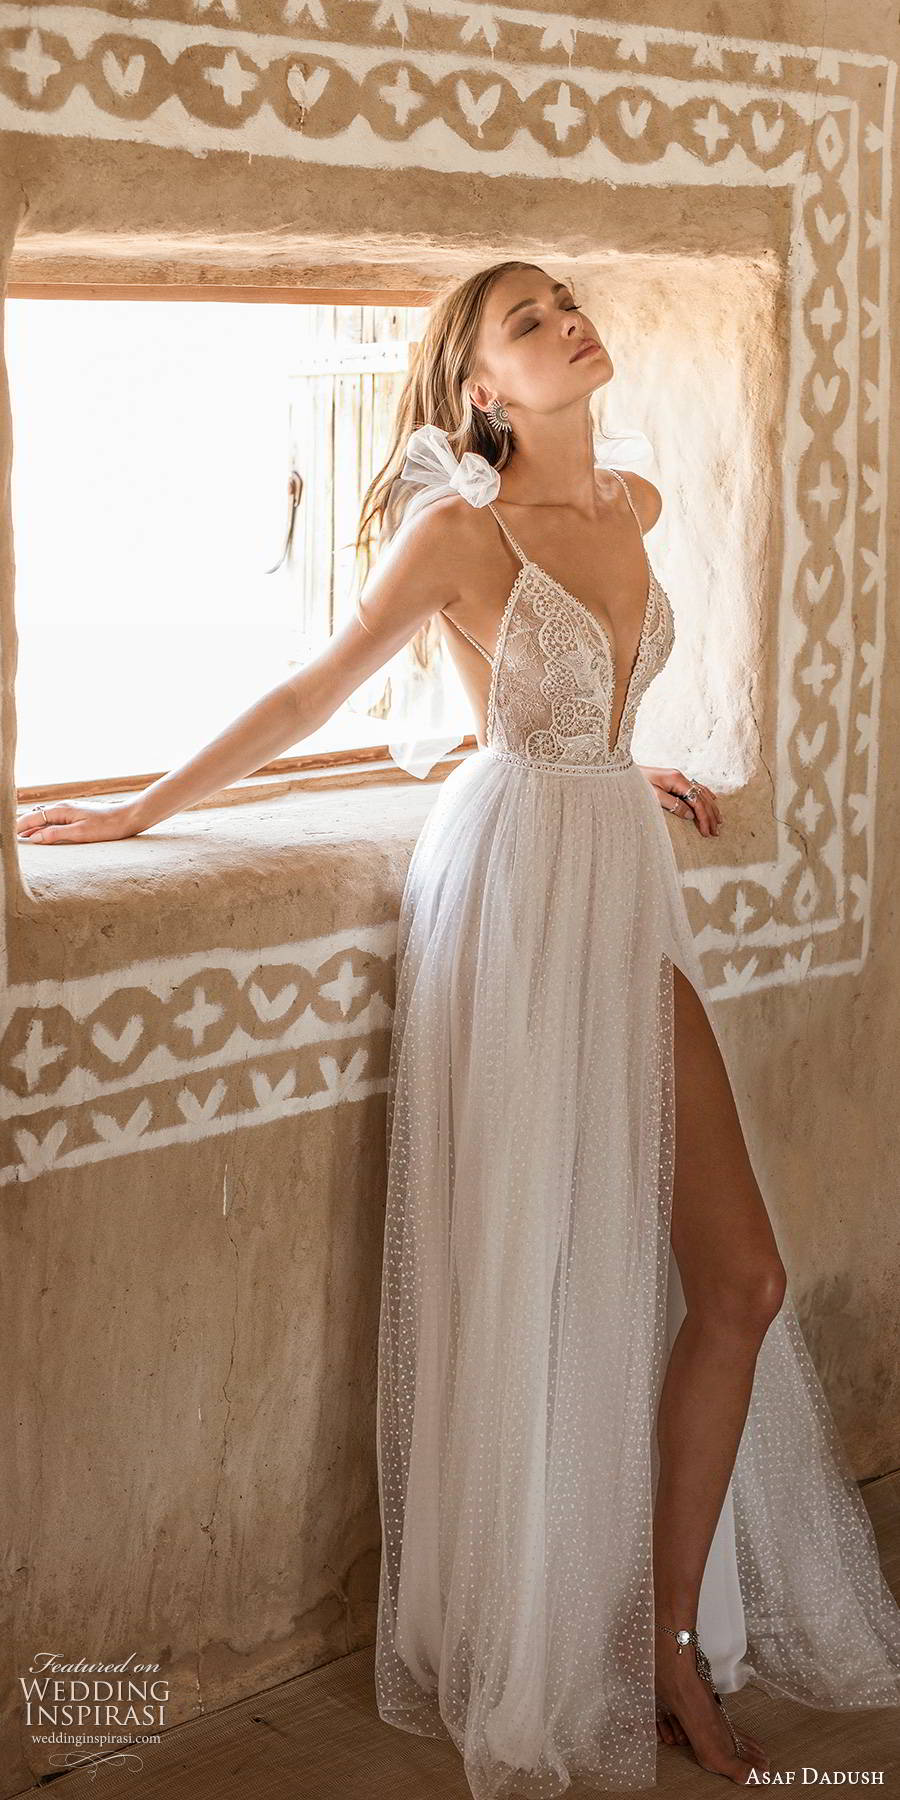 asaf dadush 2019 bridal sleeveless thin straps plunging v neckline fully embellished slit skirt lace soft a line wedding dress sweep train (7) mv